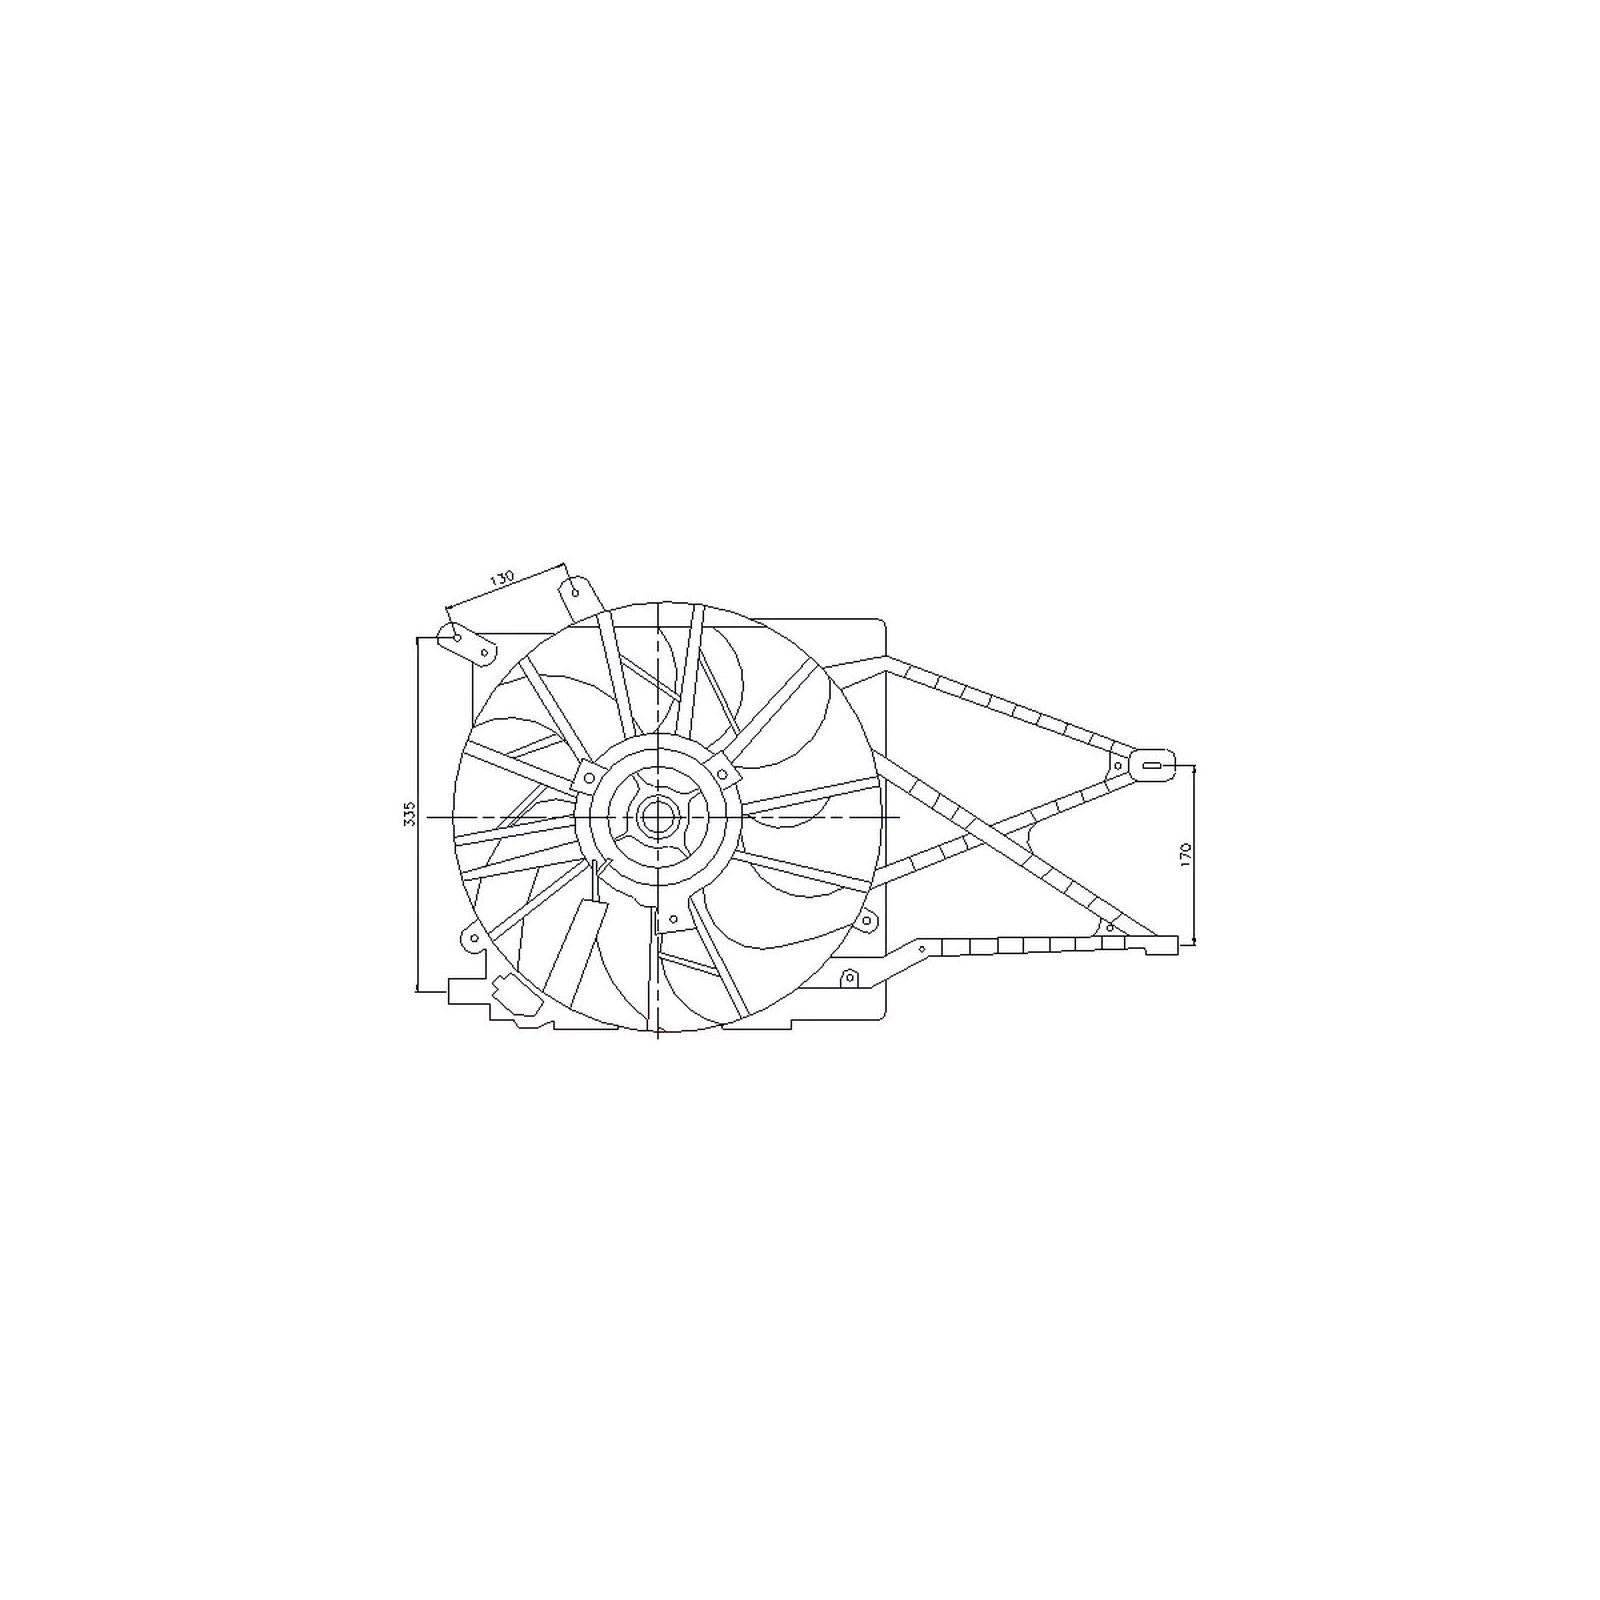 Jcb Supplier Quality Manual Wards Gilson Wiring Diagram Magneto Array Hyundai Auto Electrical Rh Used Ml